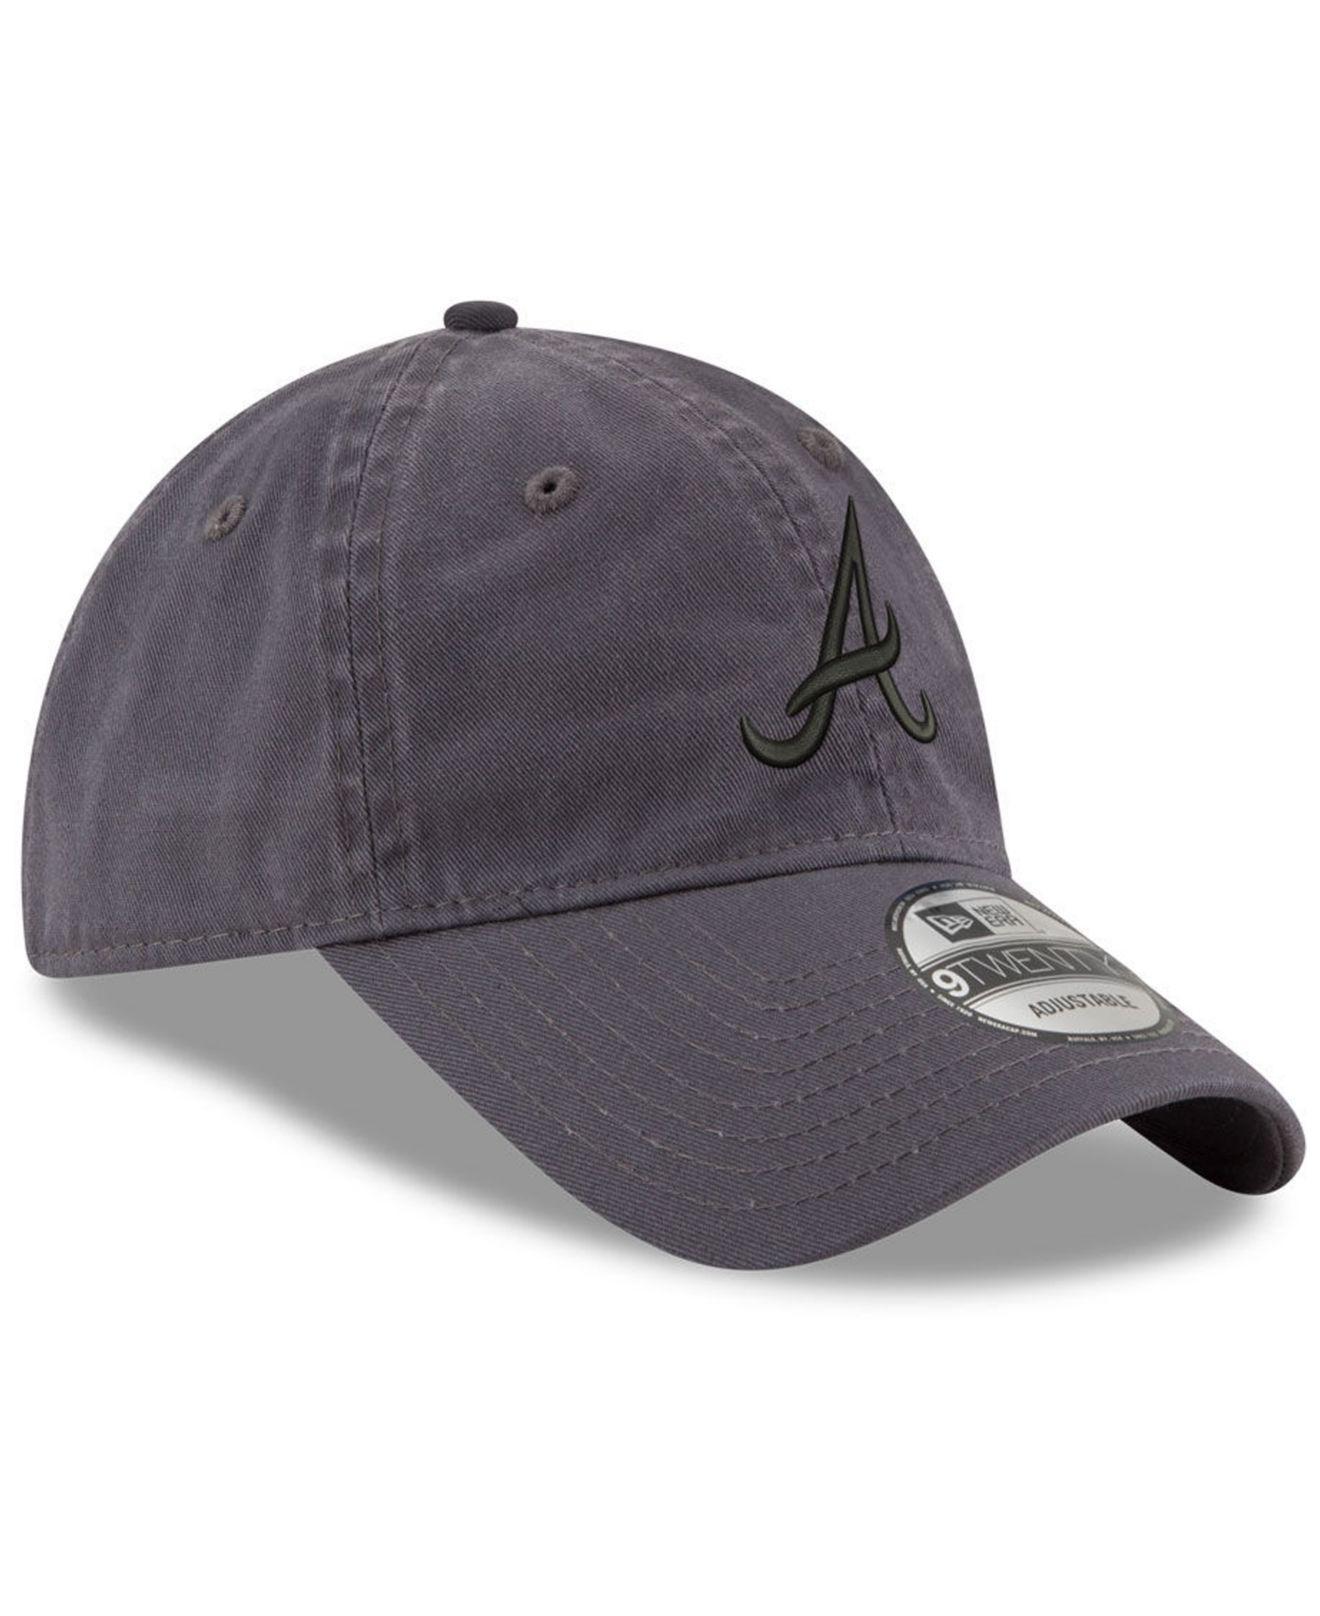 promo code 1bf30 a0738 ... shop atlanta braves graphite 9twenty cap for men lyst. view fullscreen  23c66 a3c3f